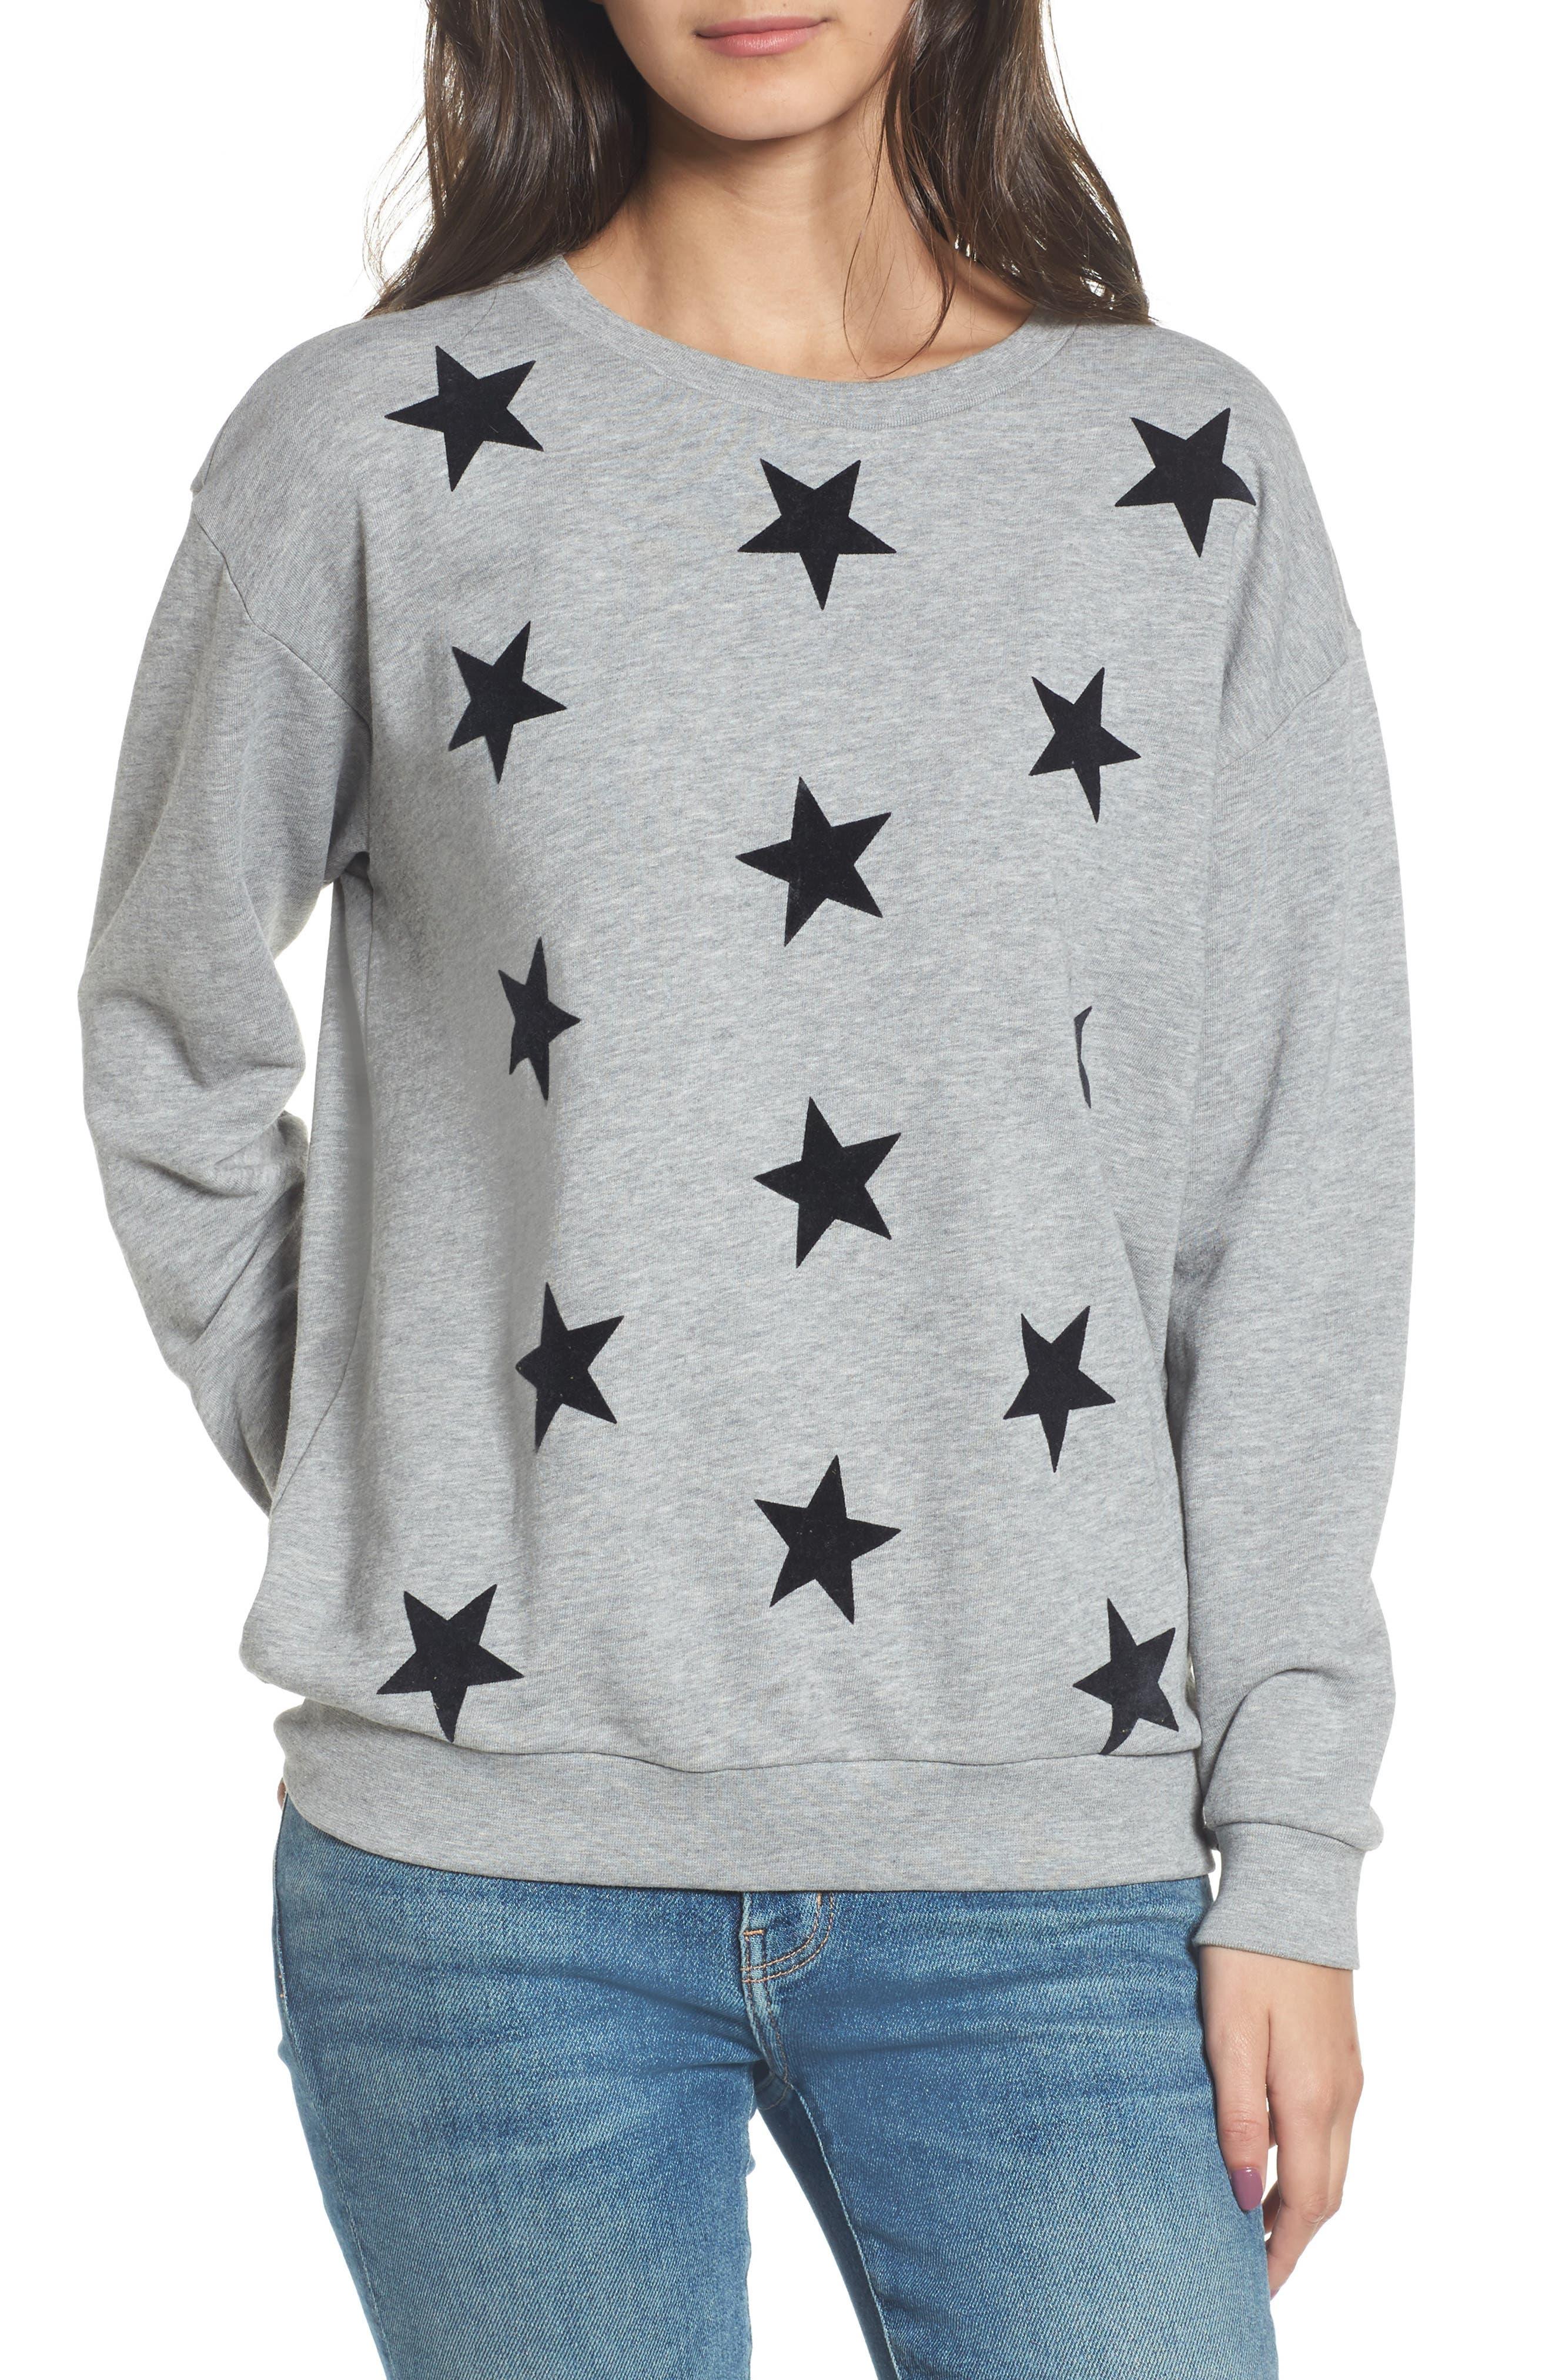 Alexa - Super Stars Sweatshirt,                             Main thumbnail 1, color,                             GREY